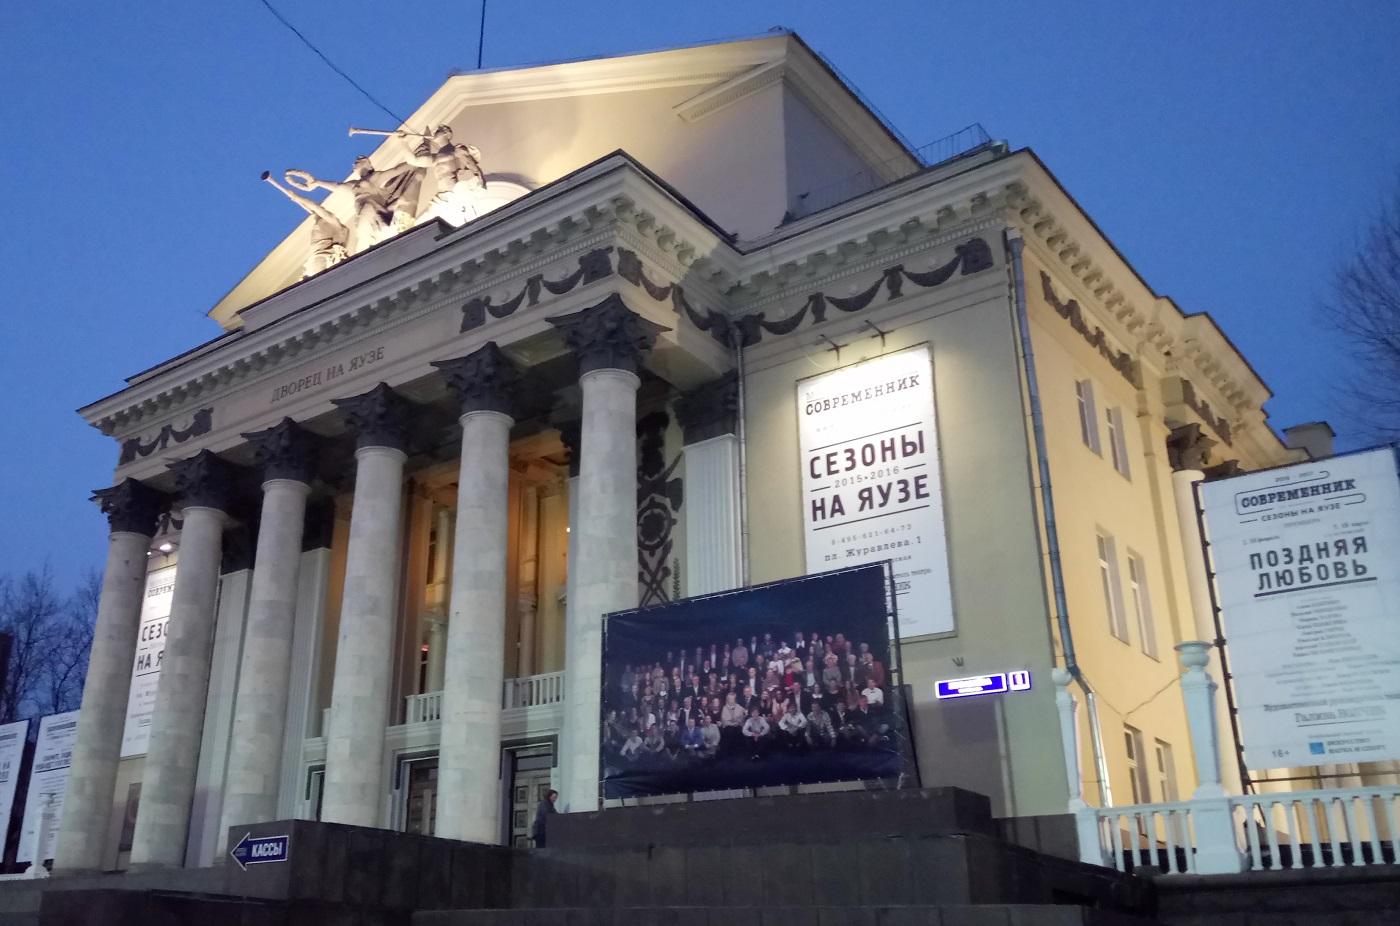 Moskva teater